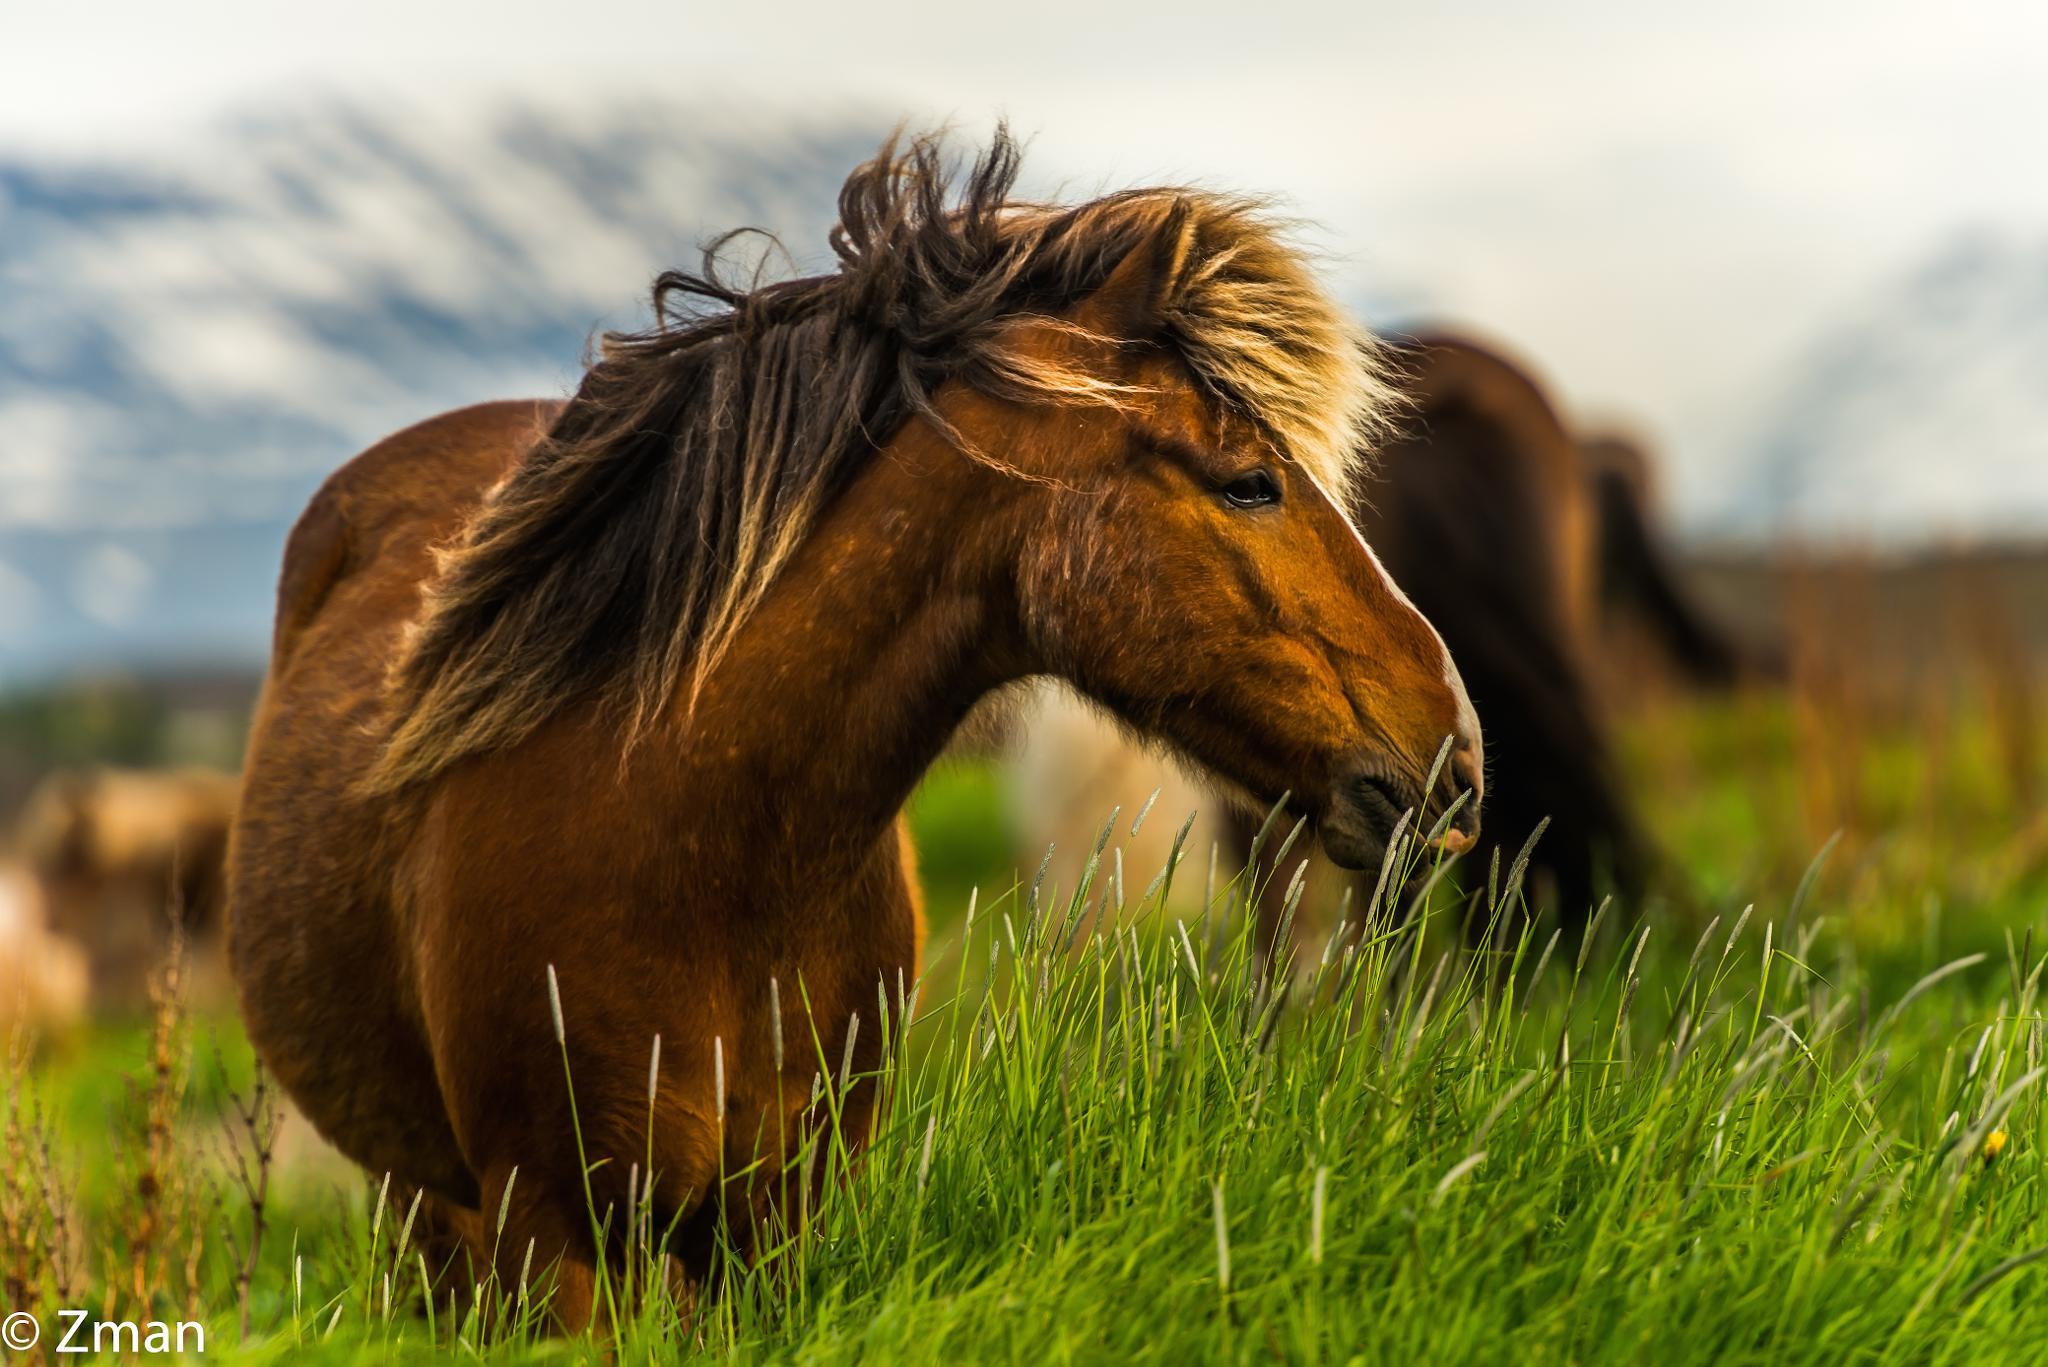 The Icelandic Horse 02 by muhammad.nasser.963